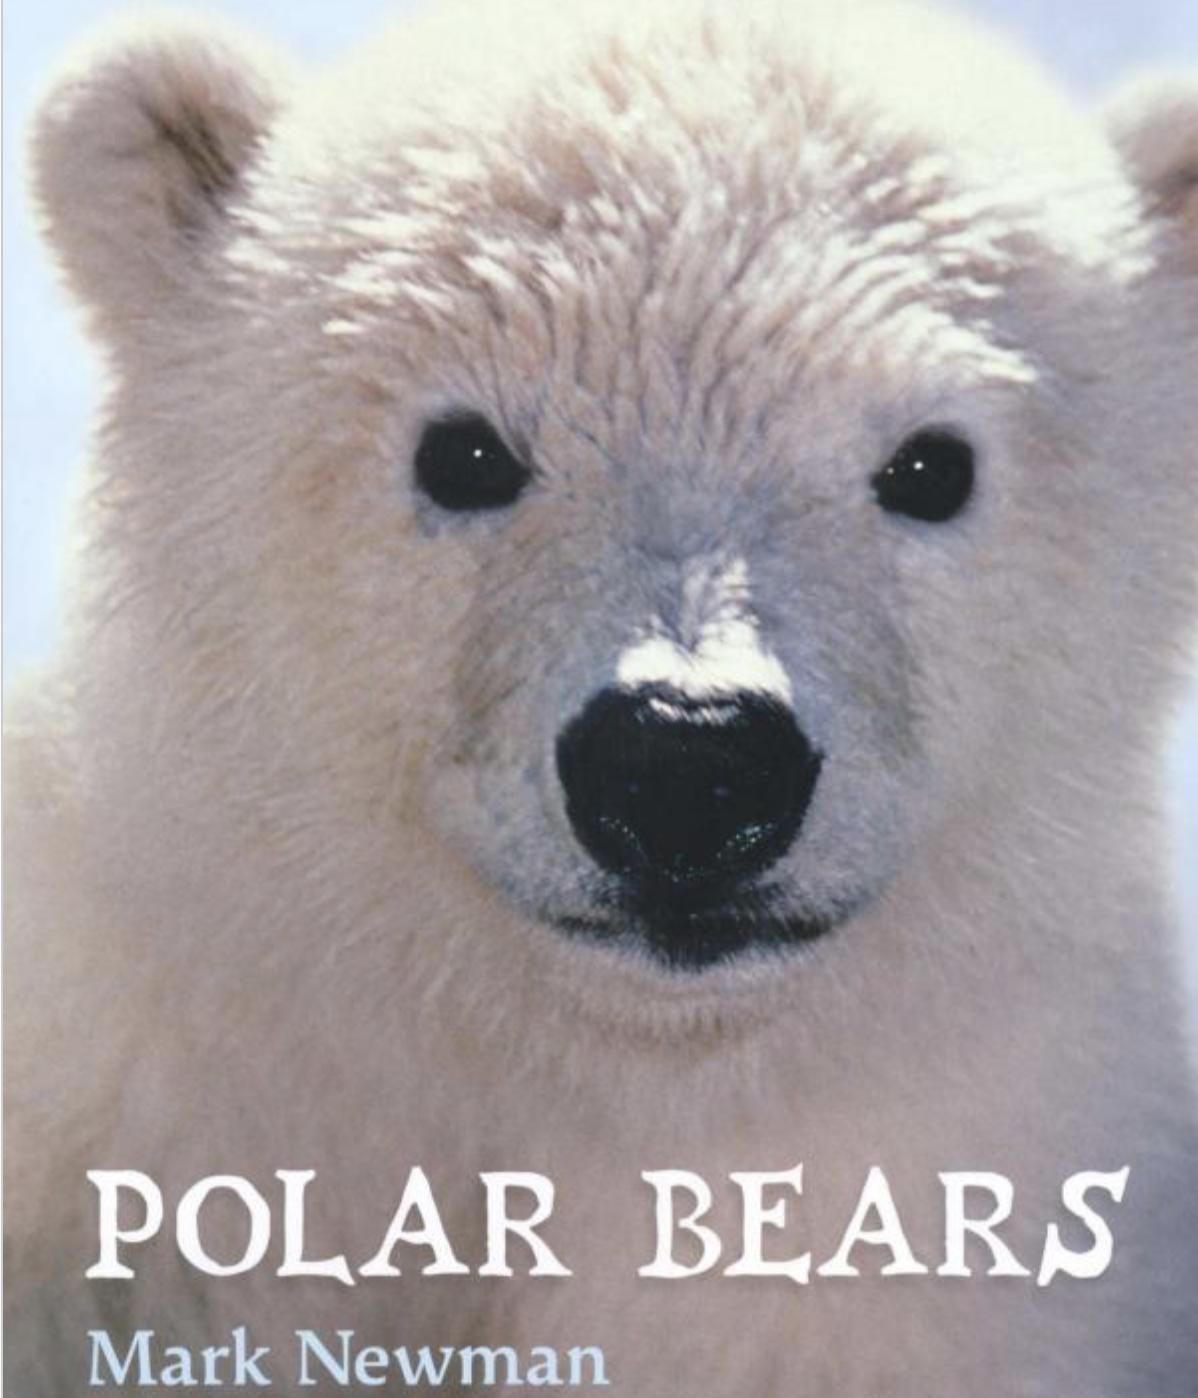 Screen%2BShot%2B2018 02 02%2Bat%2B3.37.21%2BPM learning lessons with amy labrasciano polar bears ela lesson